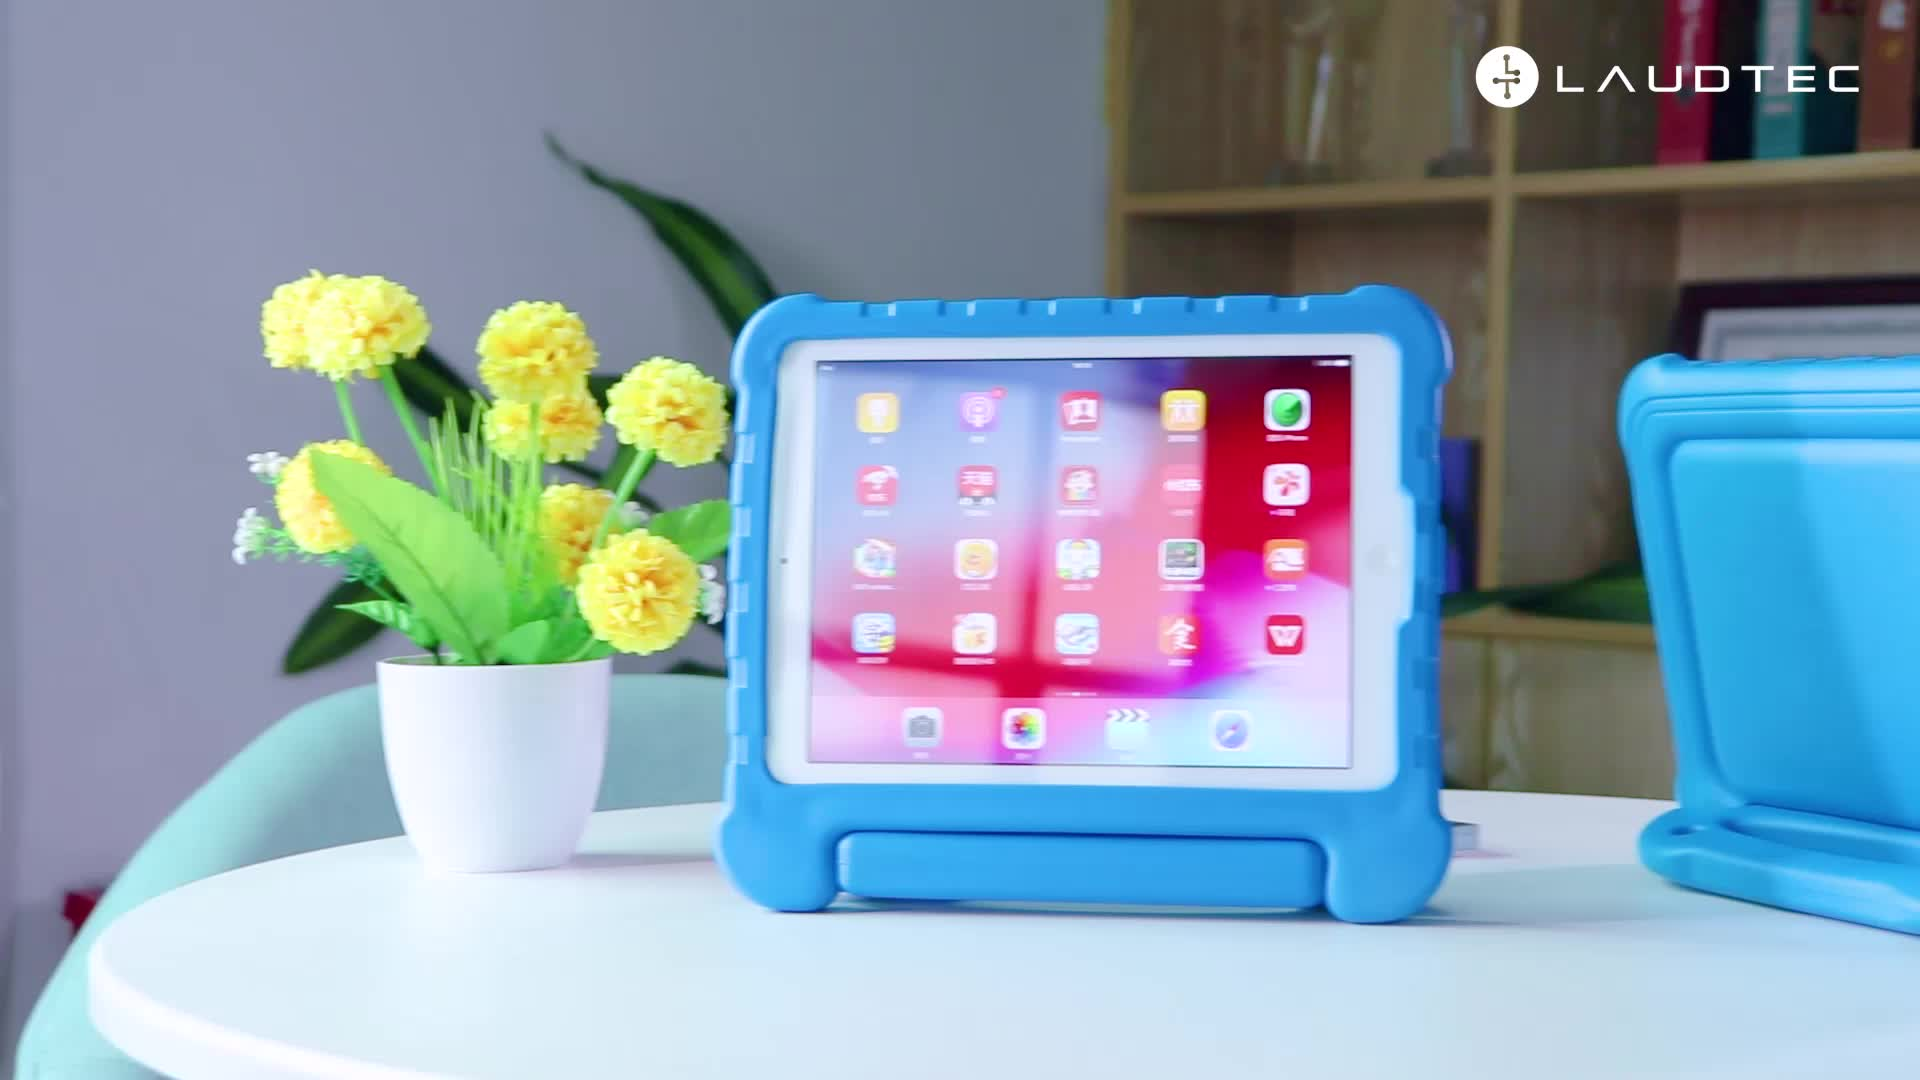 Anti-shock Case For Ipad Shockproof EVA Tablet Case